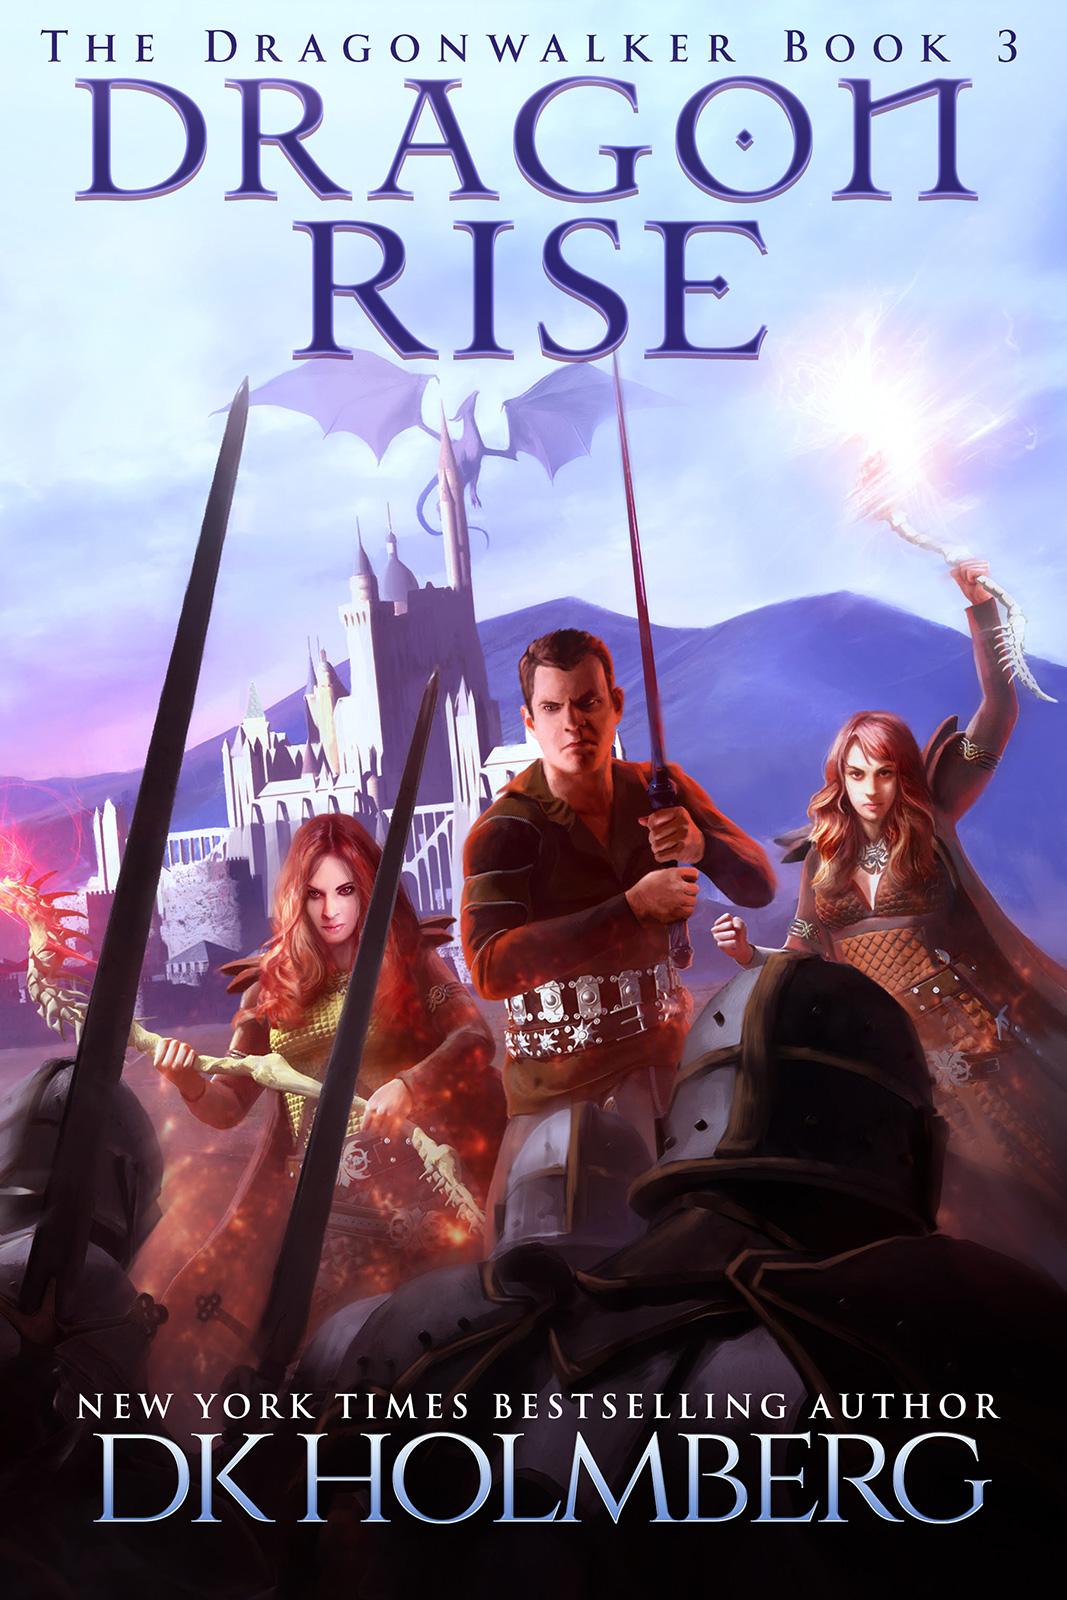 Dragon Rise by DK Holmberg